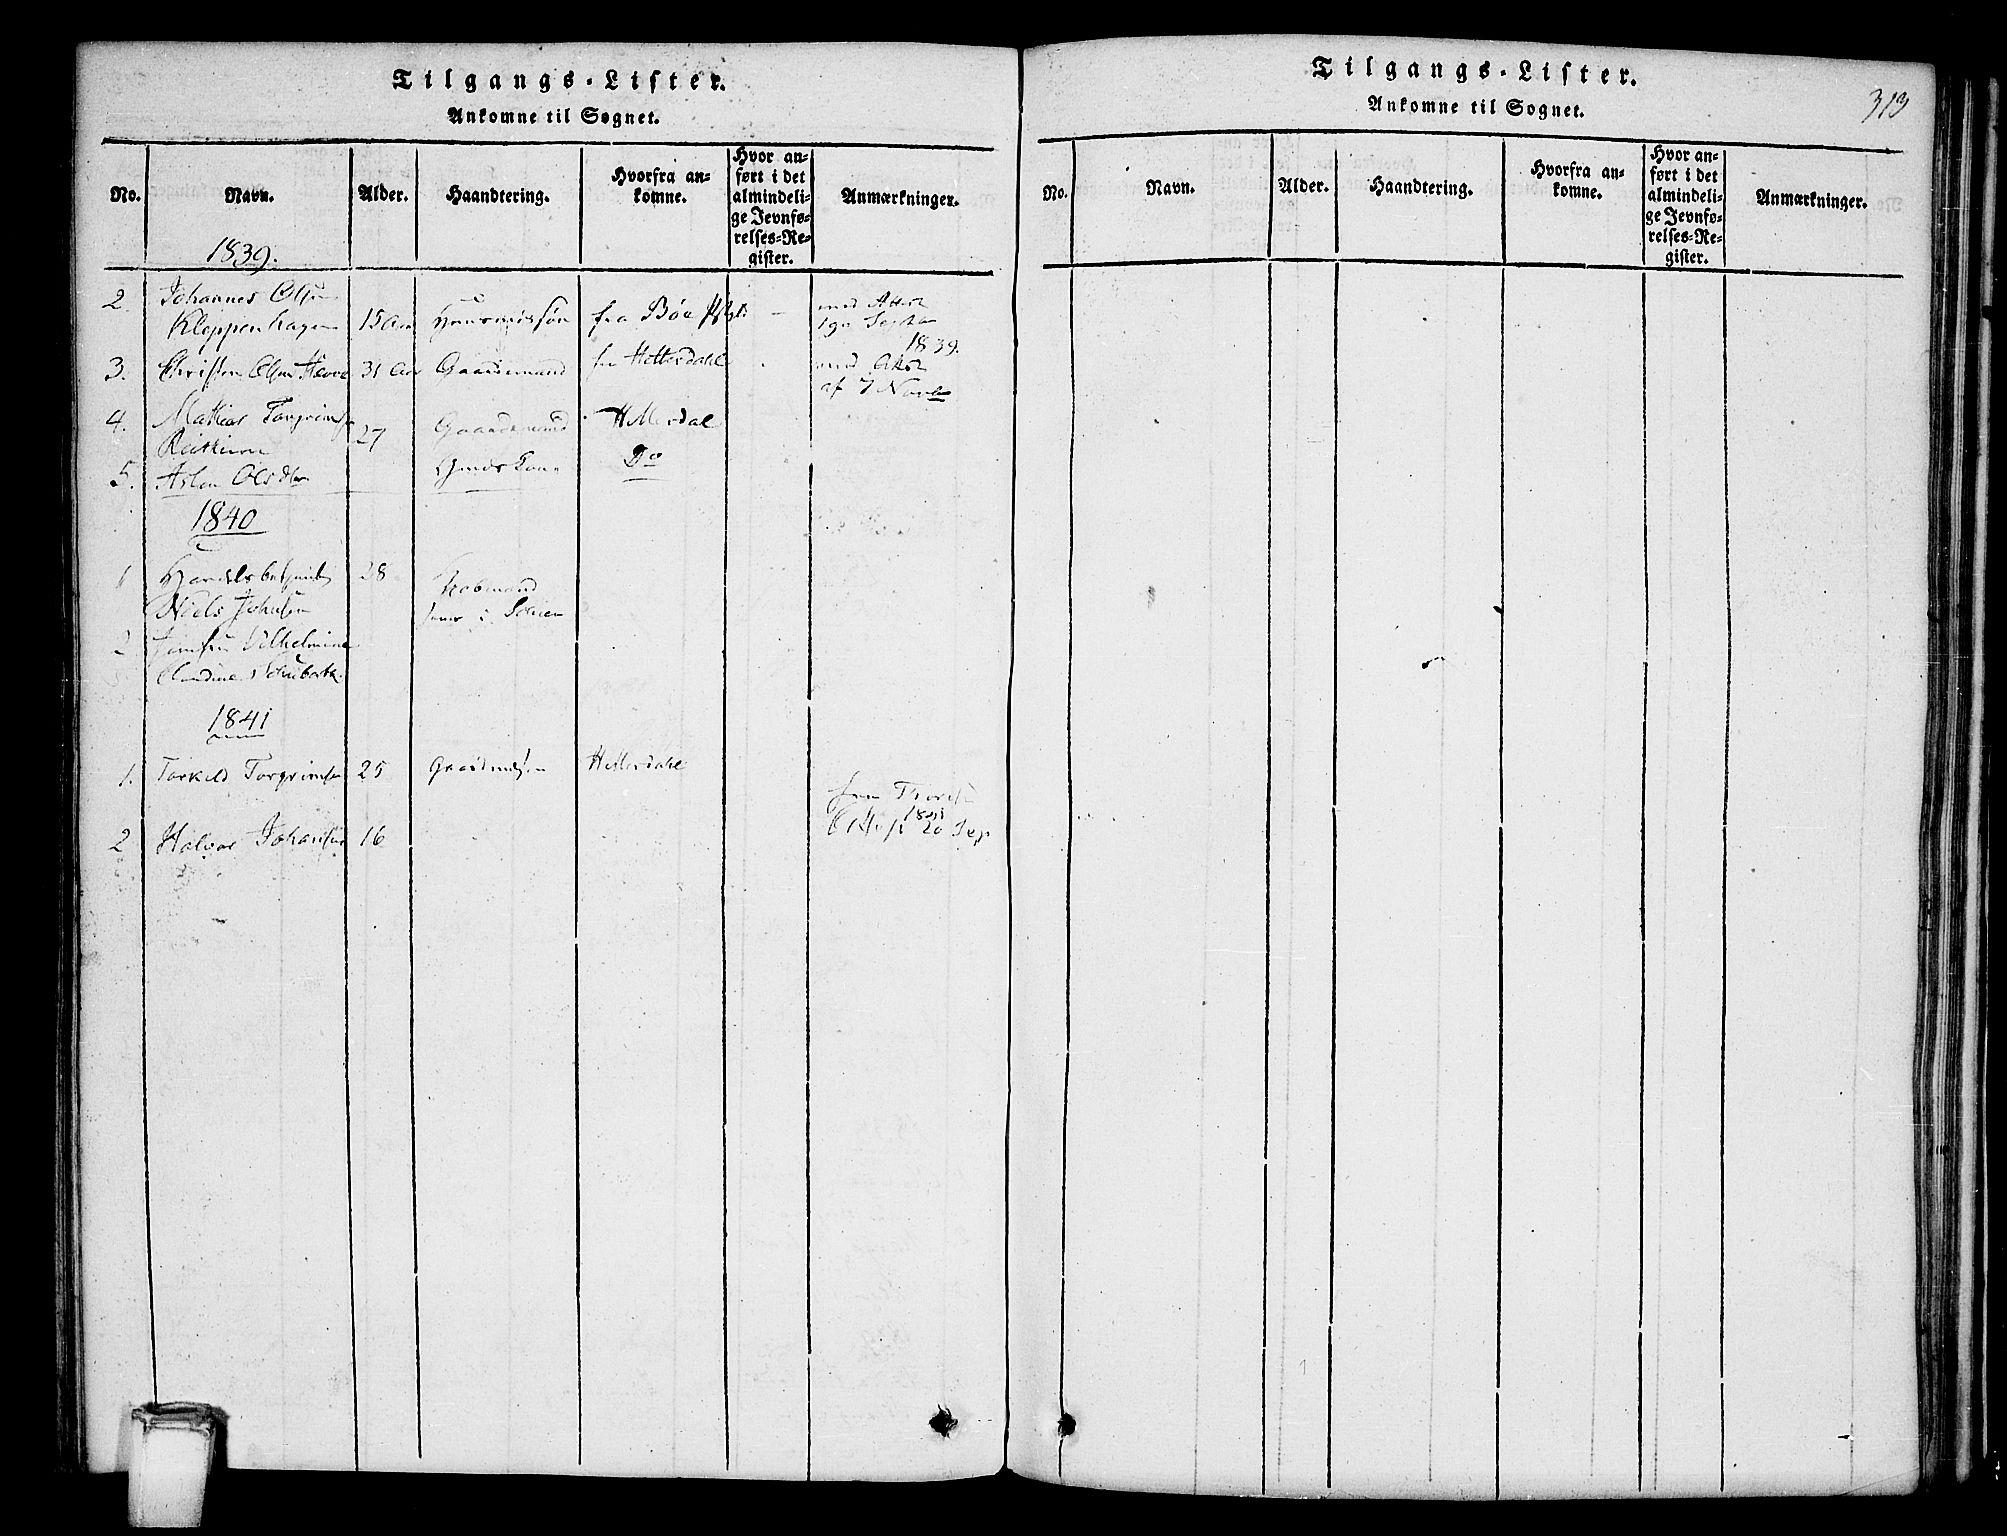 SAKO, Hjartdal kirkebøker, G/Gb/L0001: Klokkerbok nr. II 1, 1815-1842, s. 313